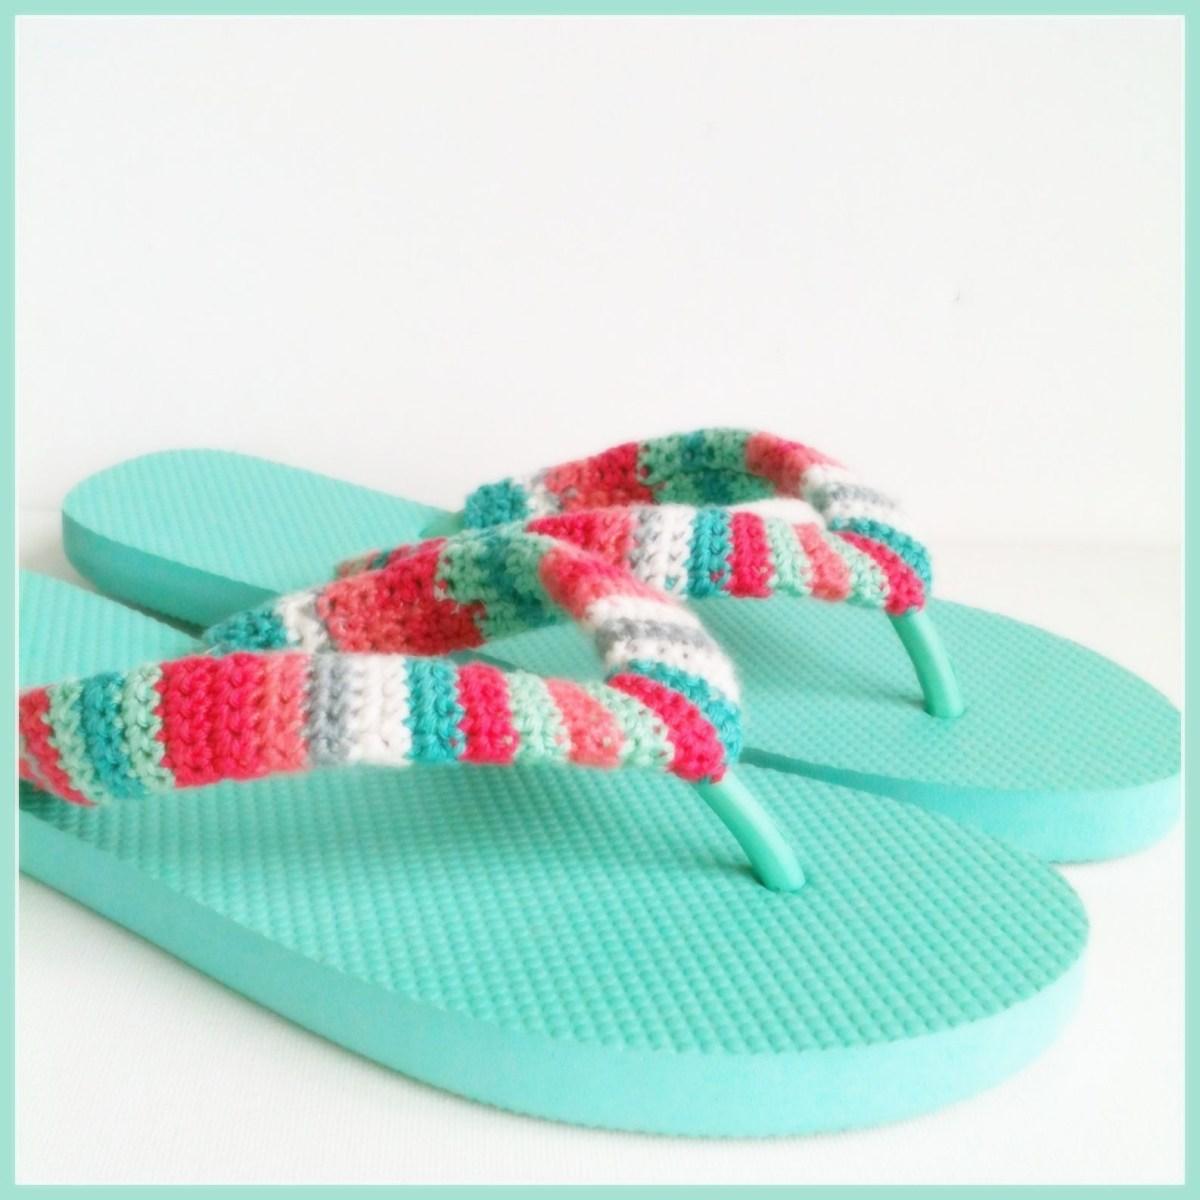 Crochet flip flops DIY Picturesque Flip Flops Ideas That Are Great For Indoor Or Beach Day